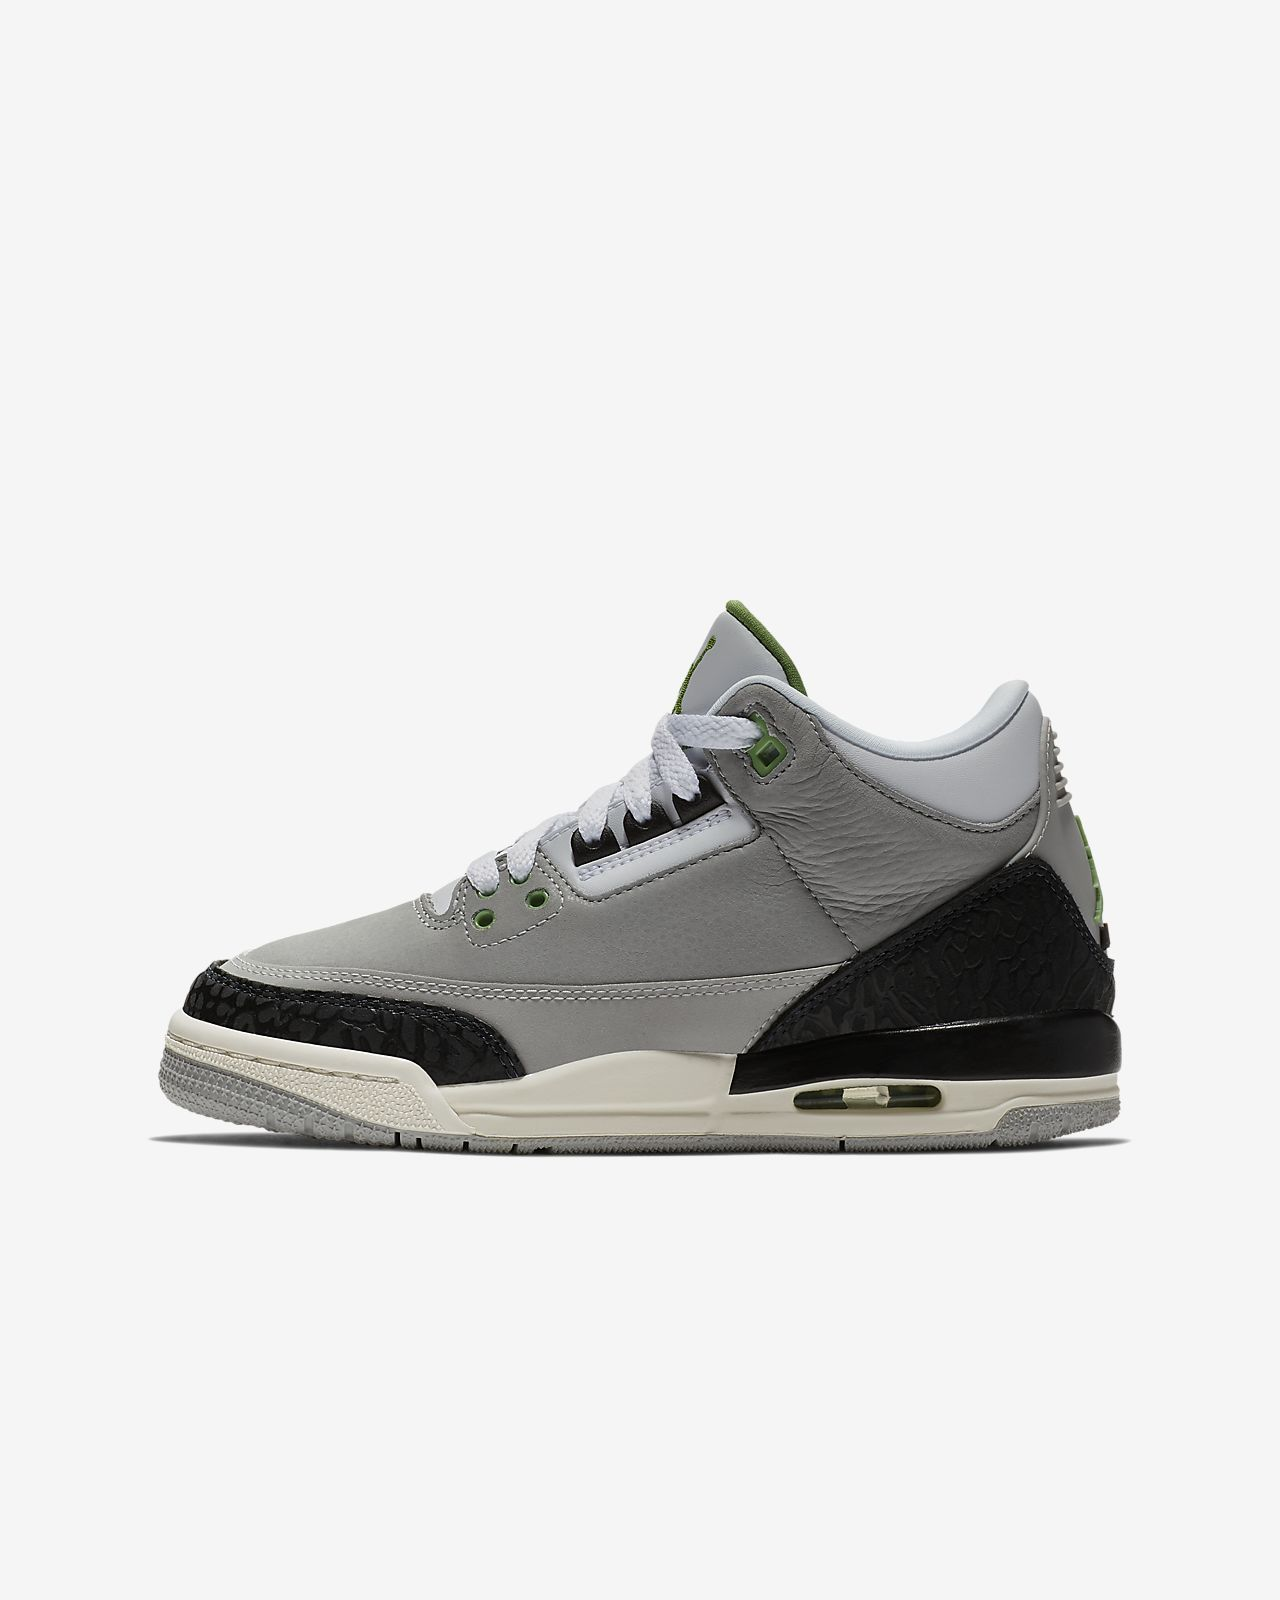 dda7cdcc детские кроссовки Air Jordan 3 Retro Nikecom Ru